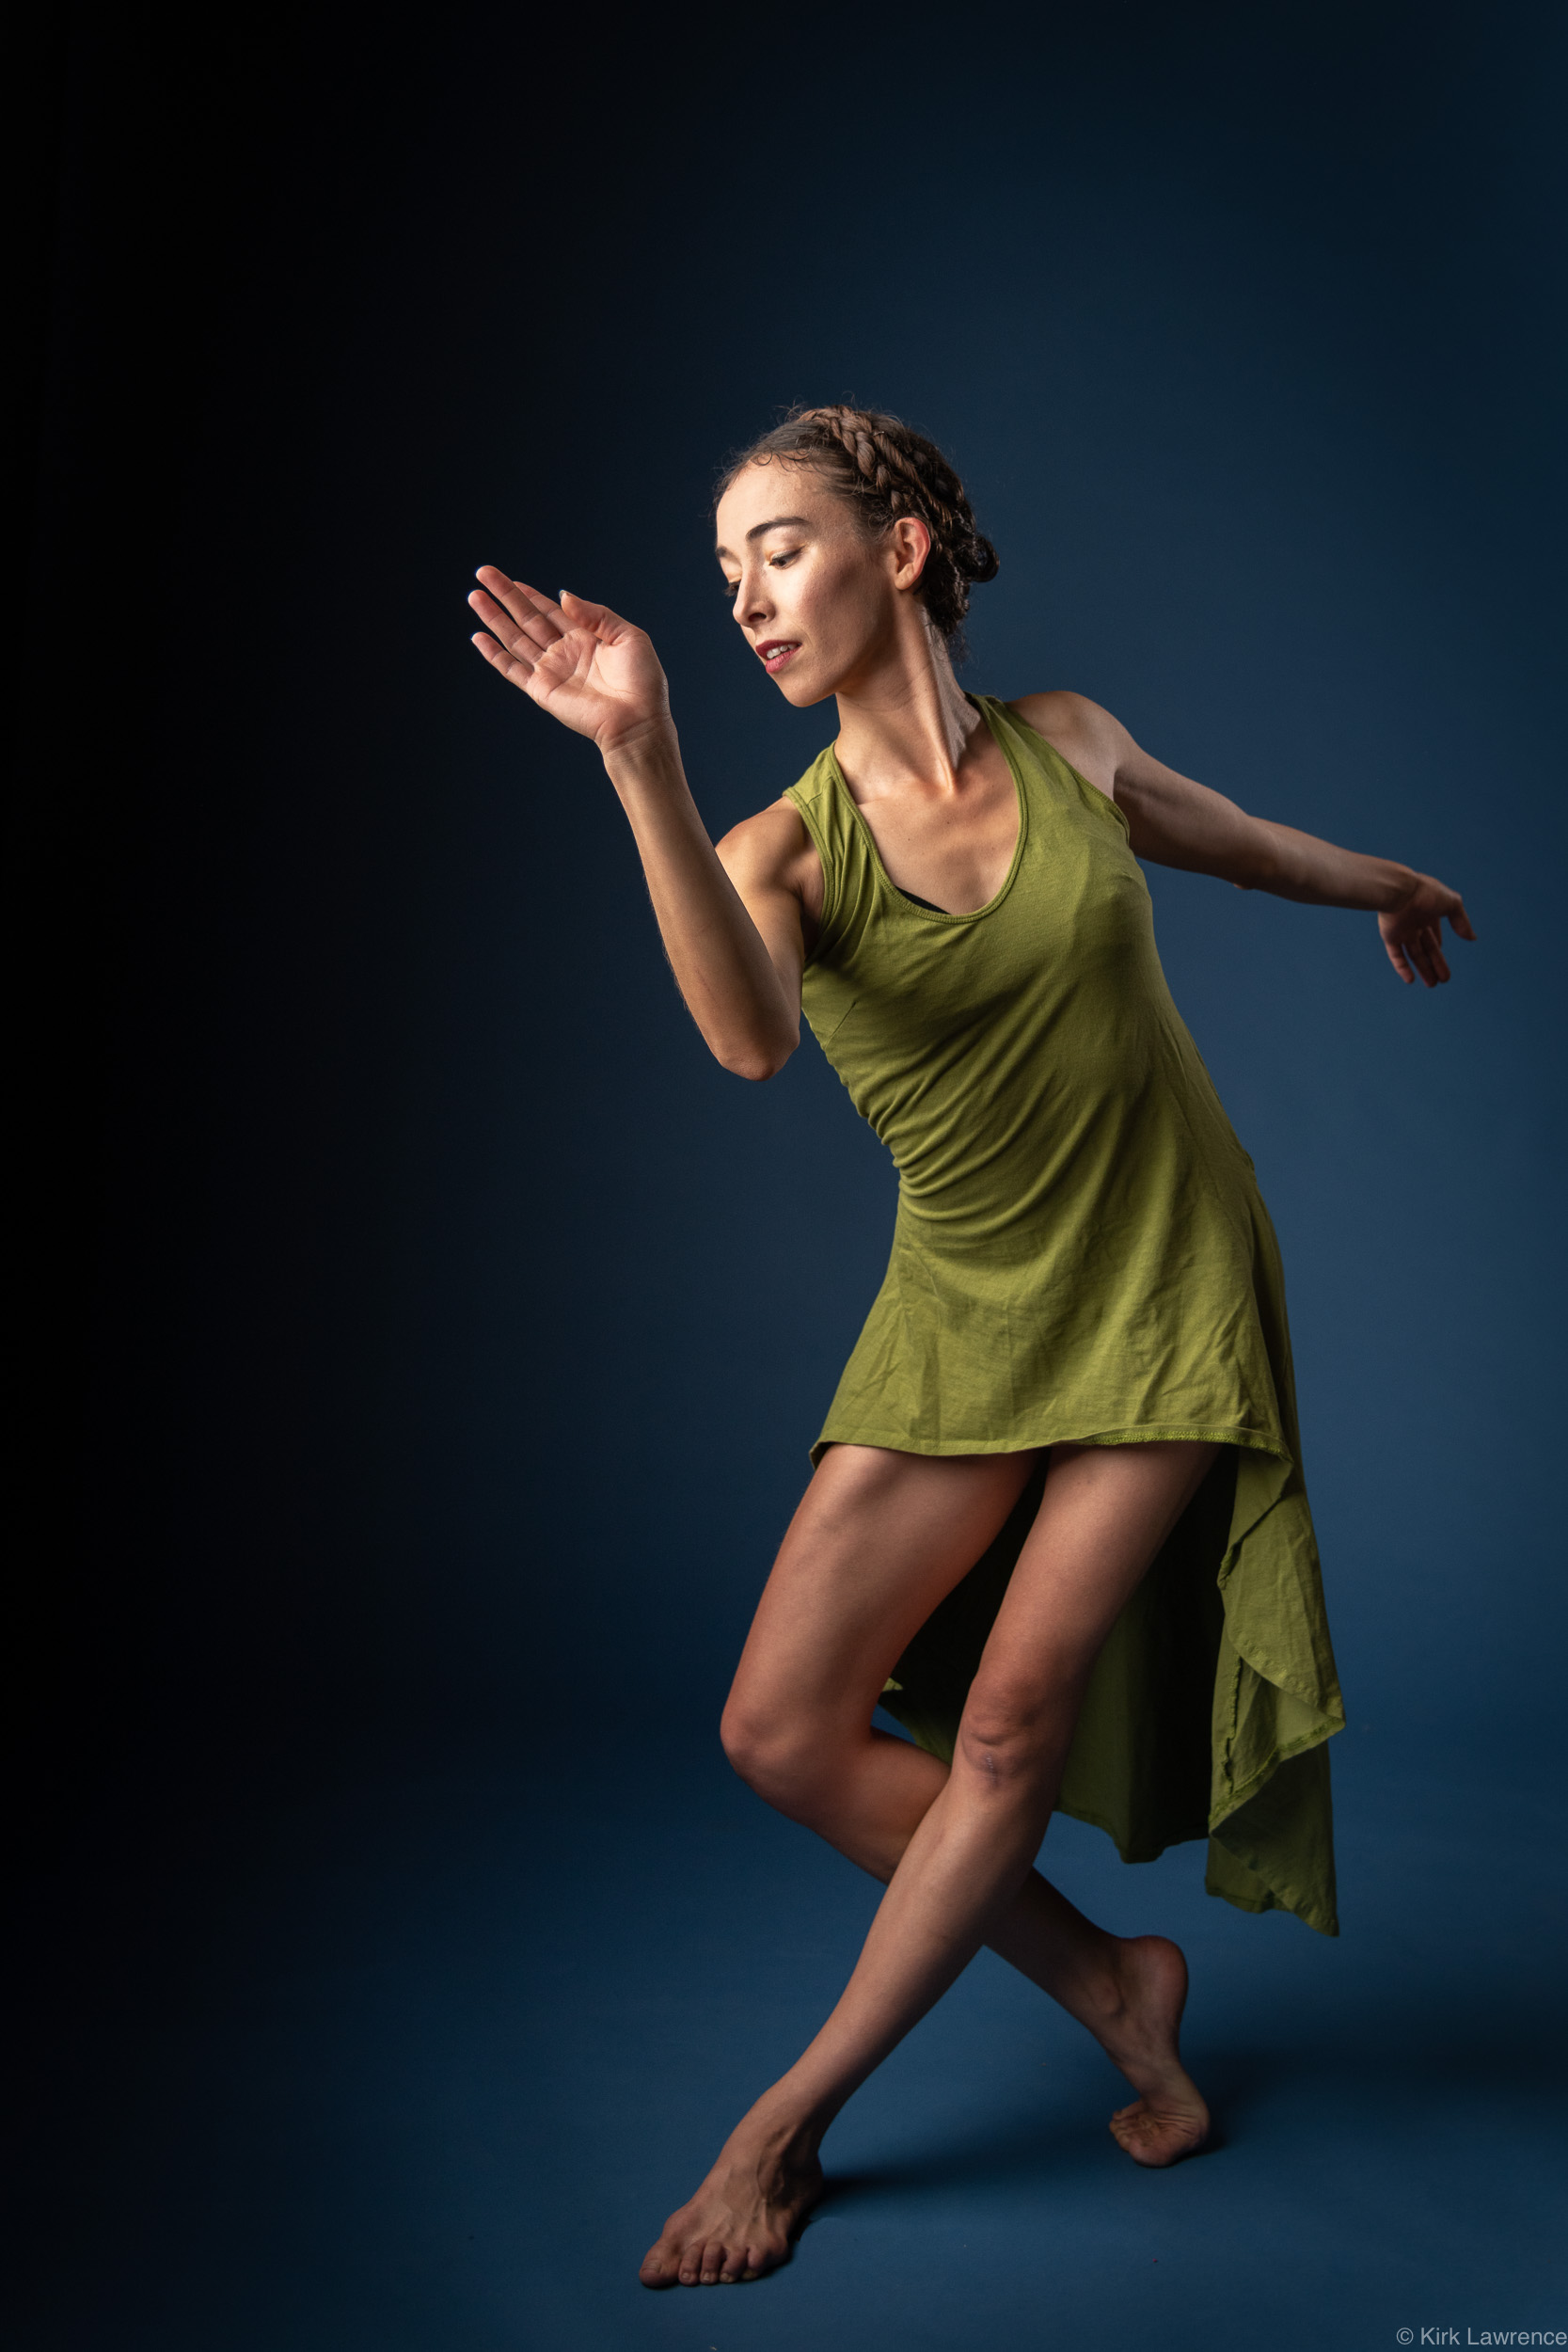 modern_dancer_green_dress_posing_portrait.jpg